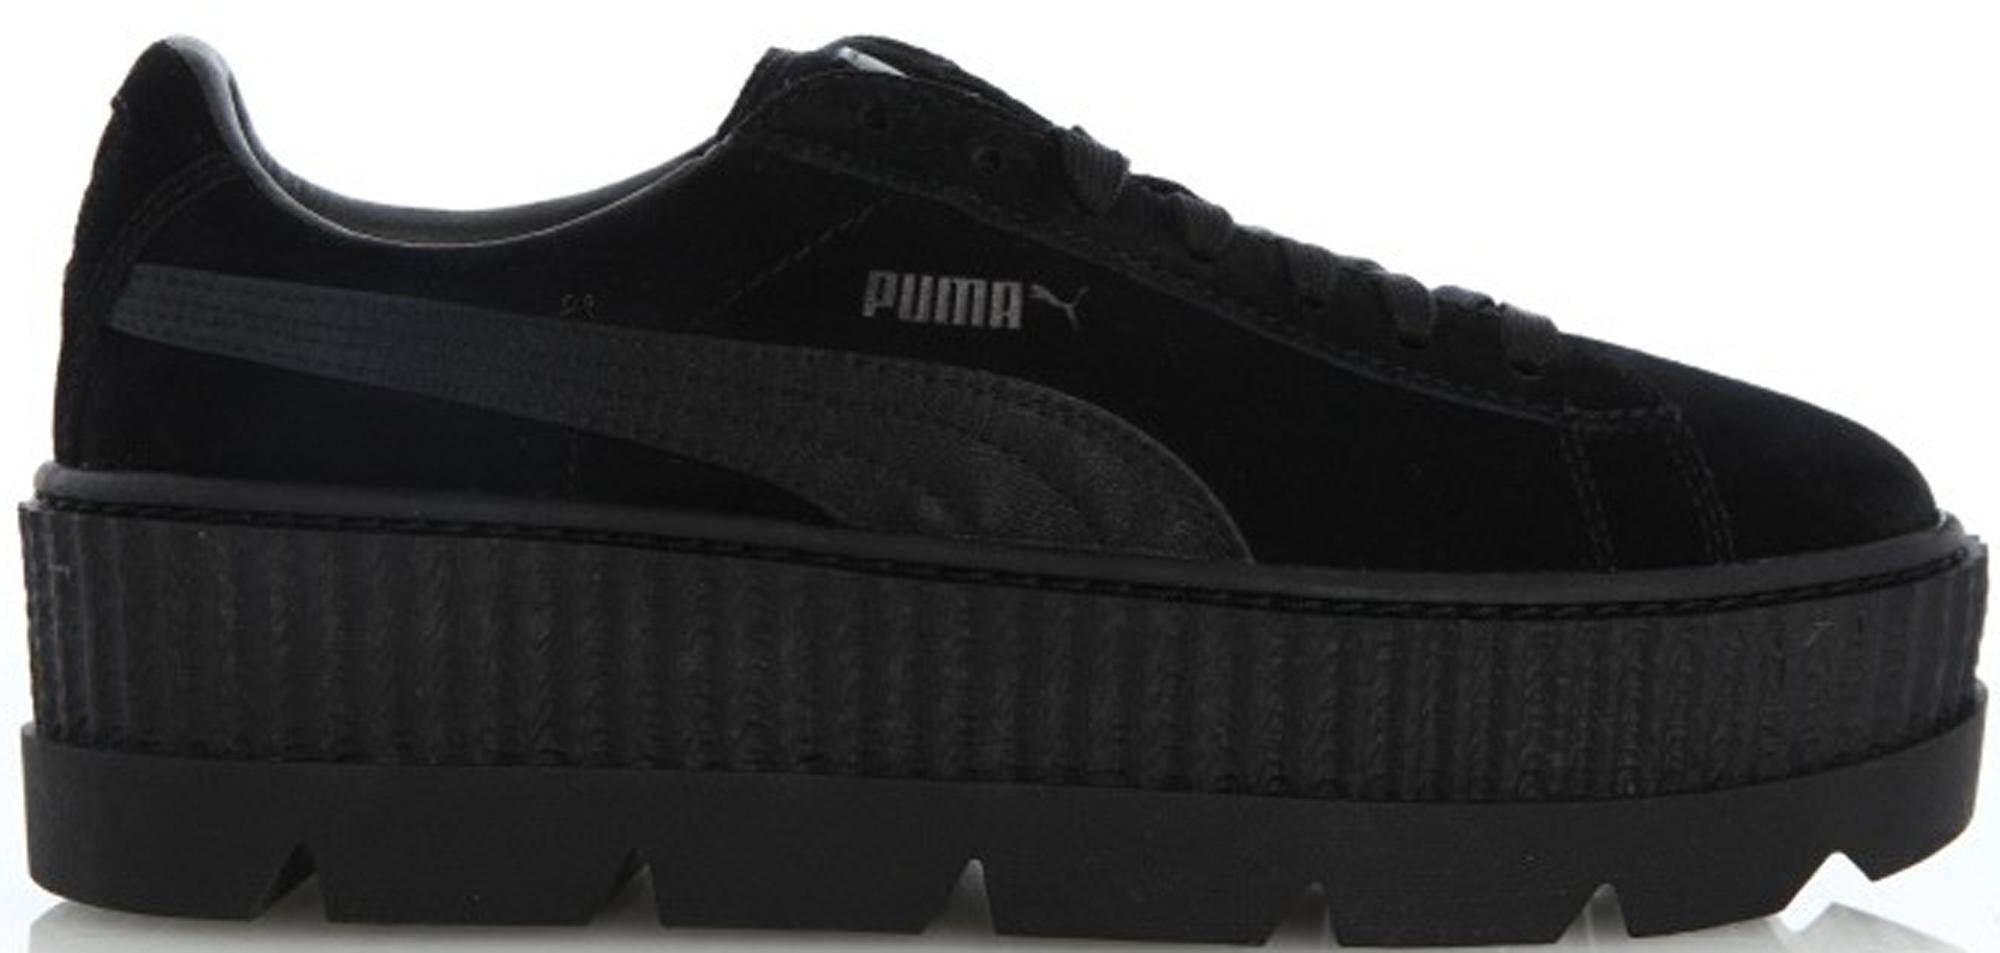 Puma Cleated Creeper Rihanna Fenty Black (W)